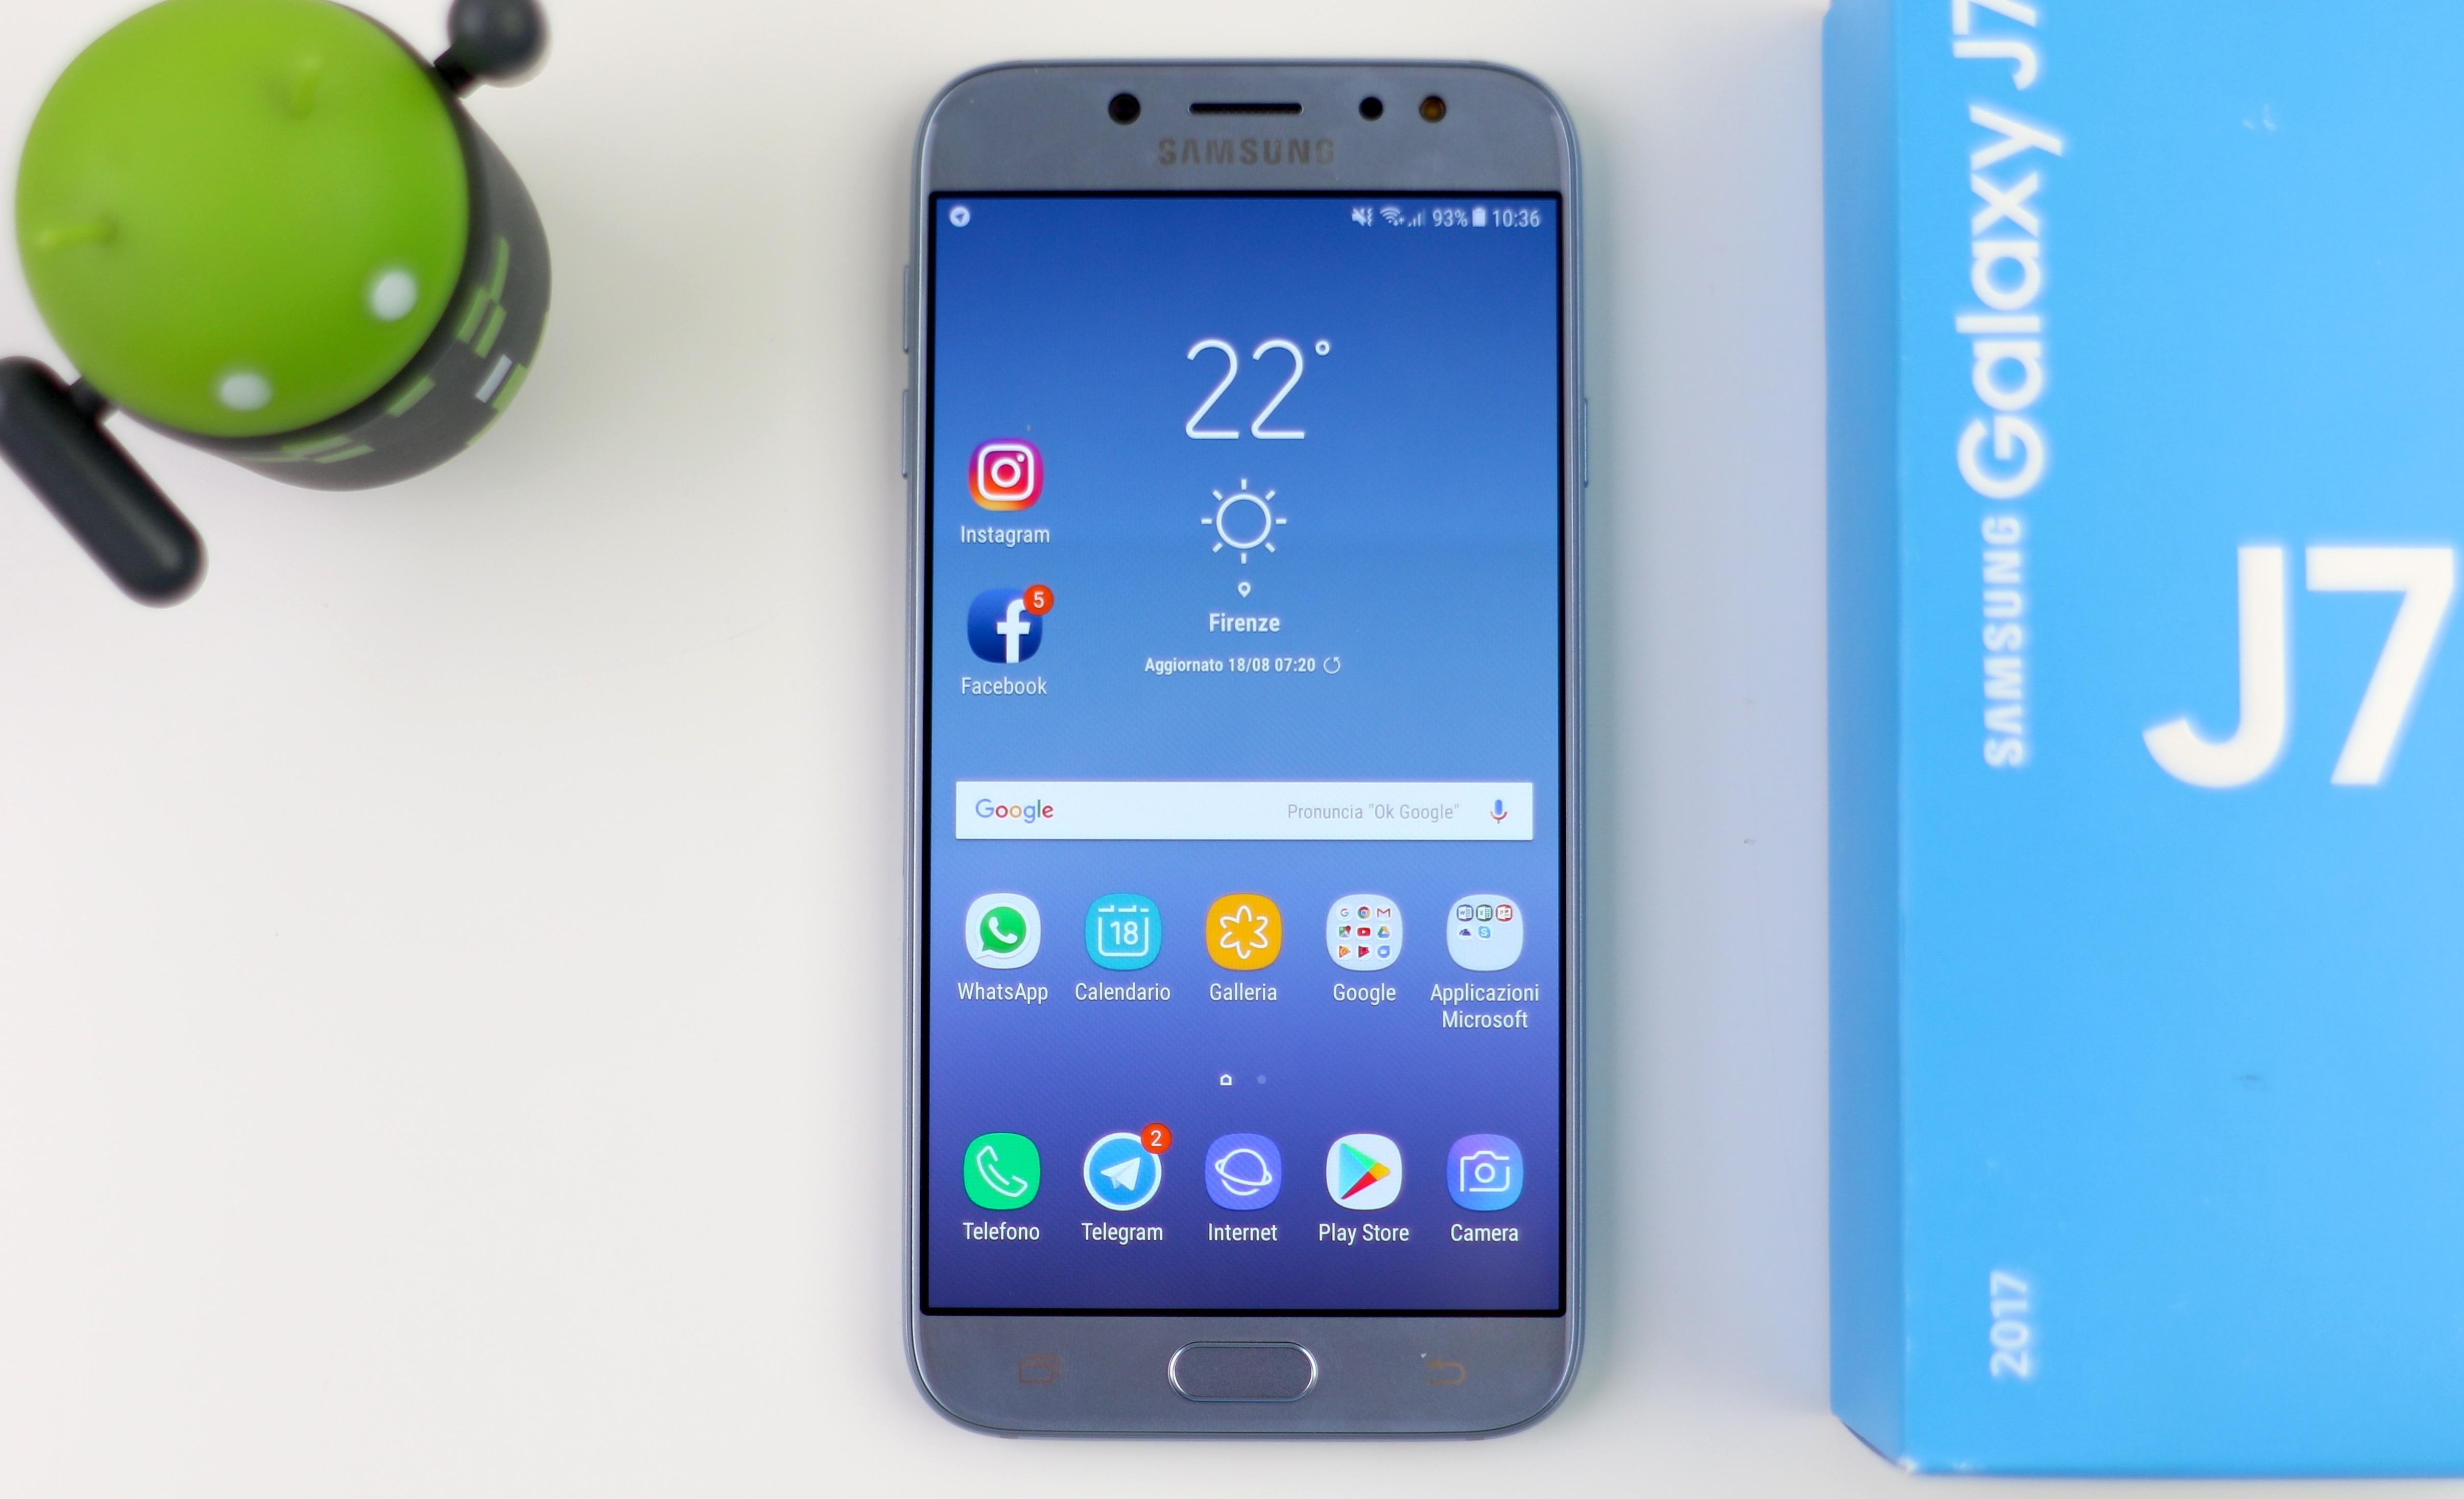 Calendario Samsung.Recensione Samsung Galaxy J7 2017 Quando La Fascia Media Offre